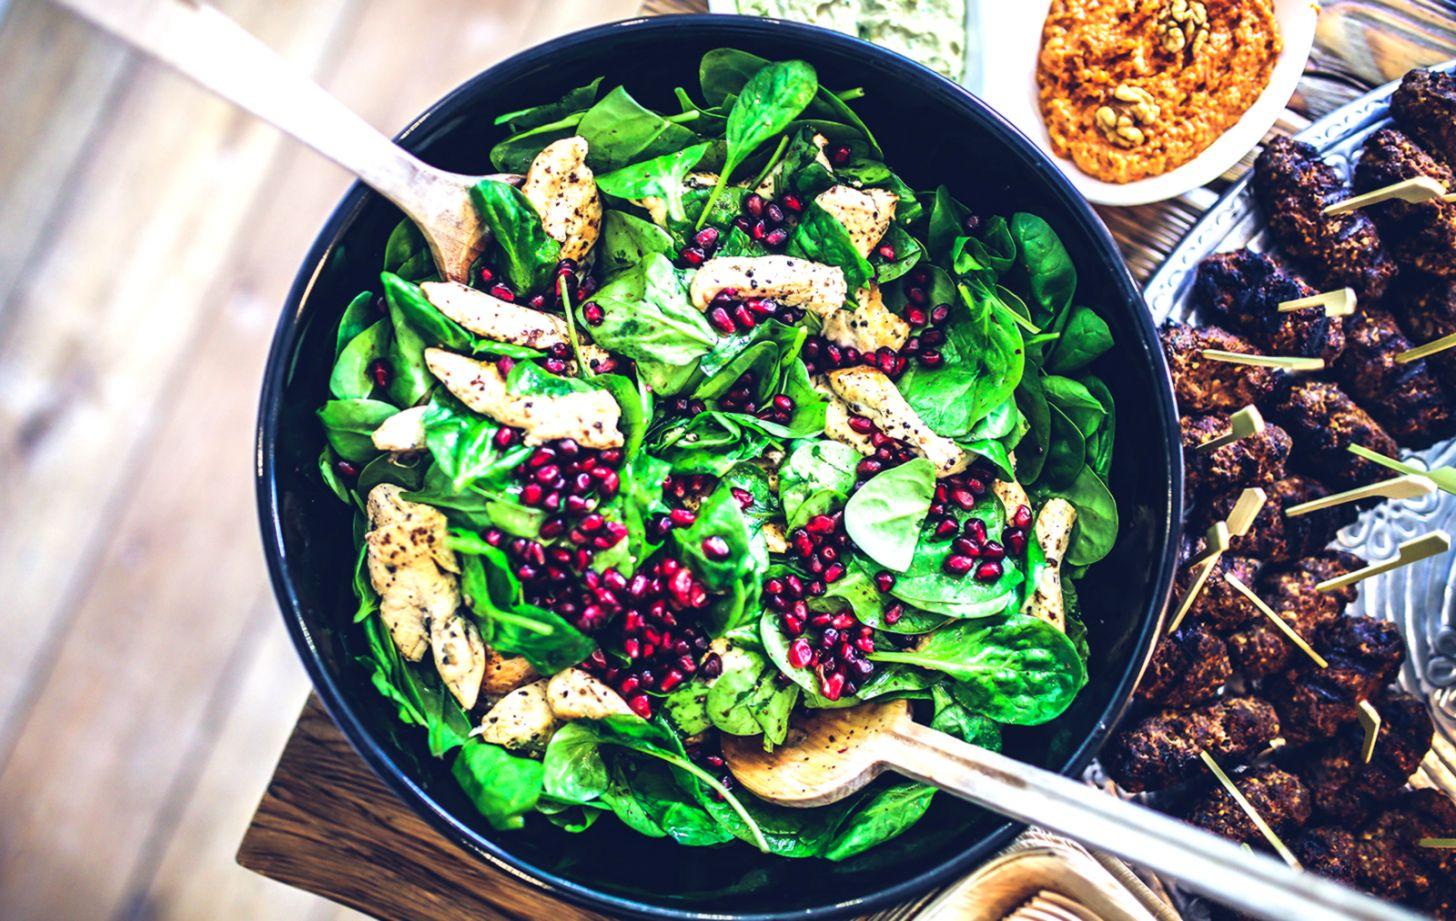 Healthy Foods Wallpapers Hd Net Wallpapers